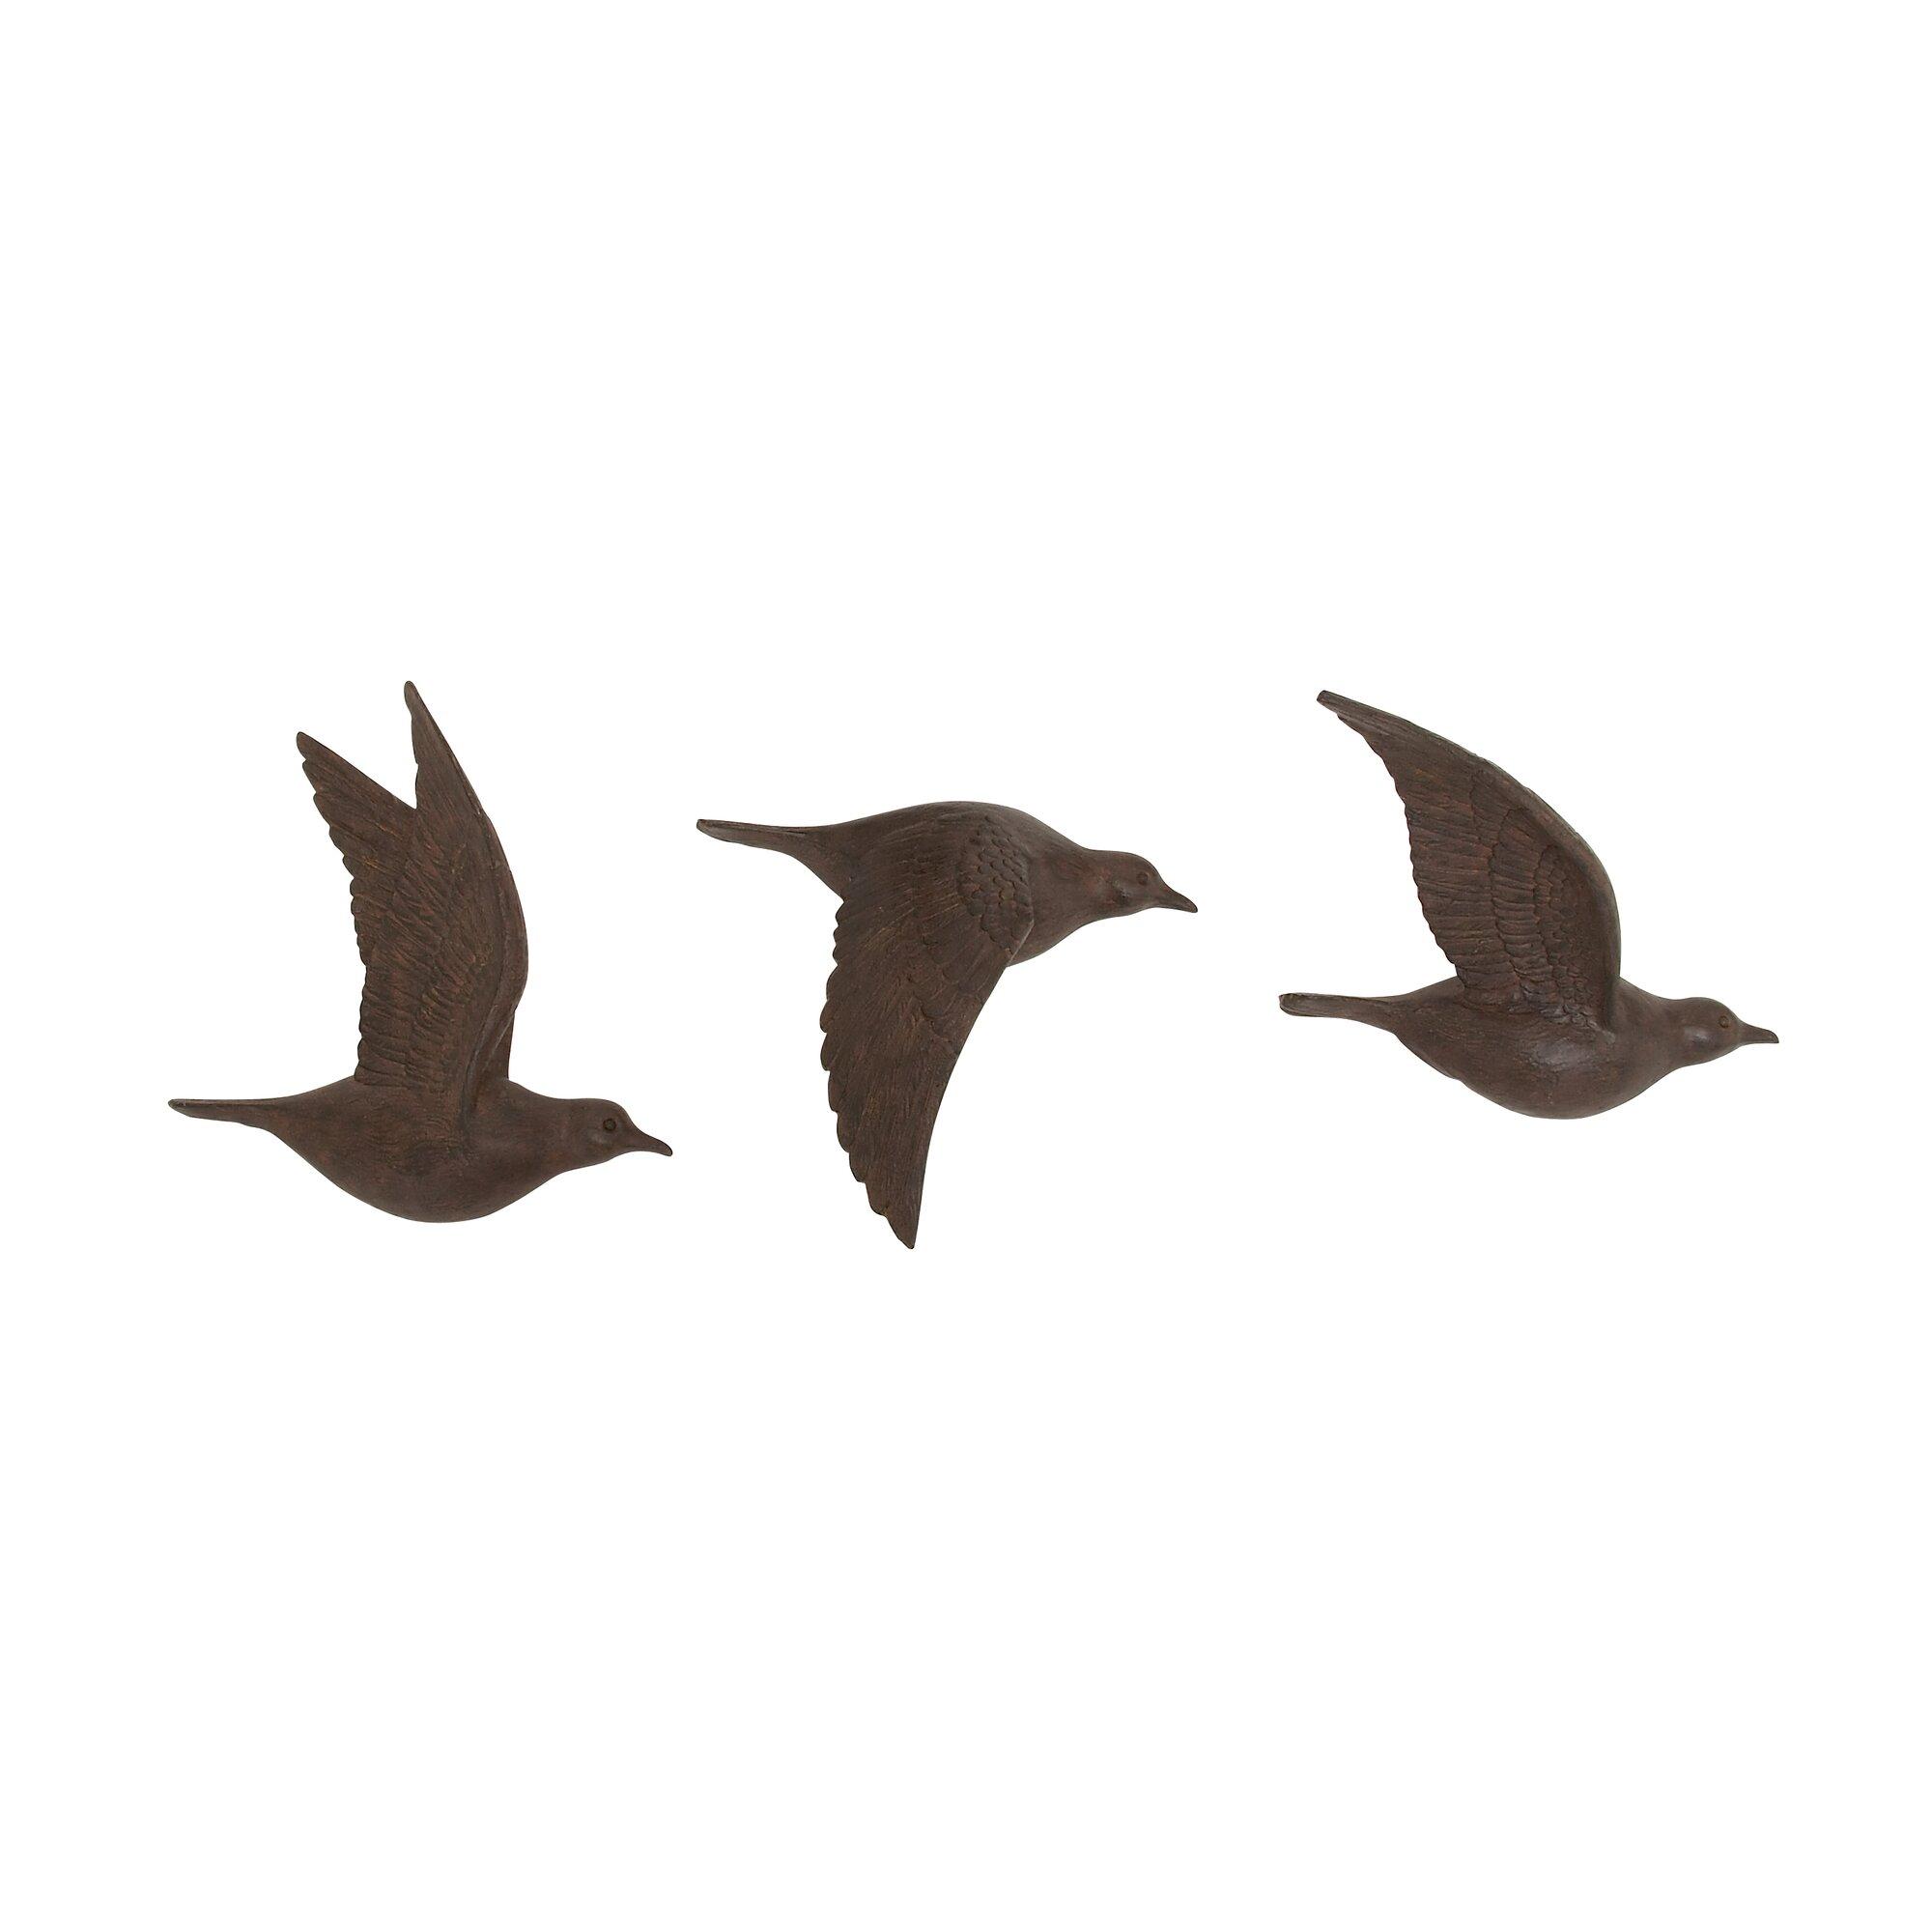 3 piece flying birds wall dcor set - Bird Wall Decor